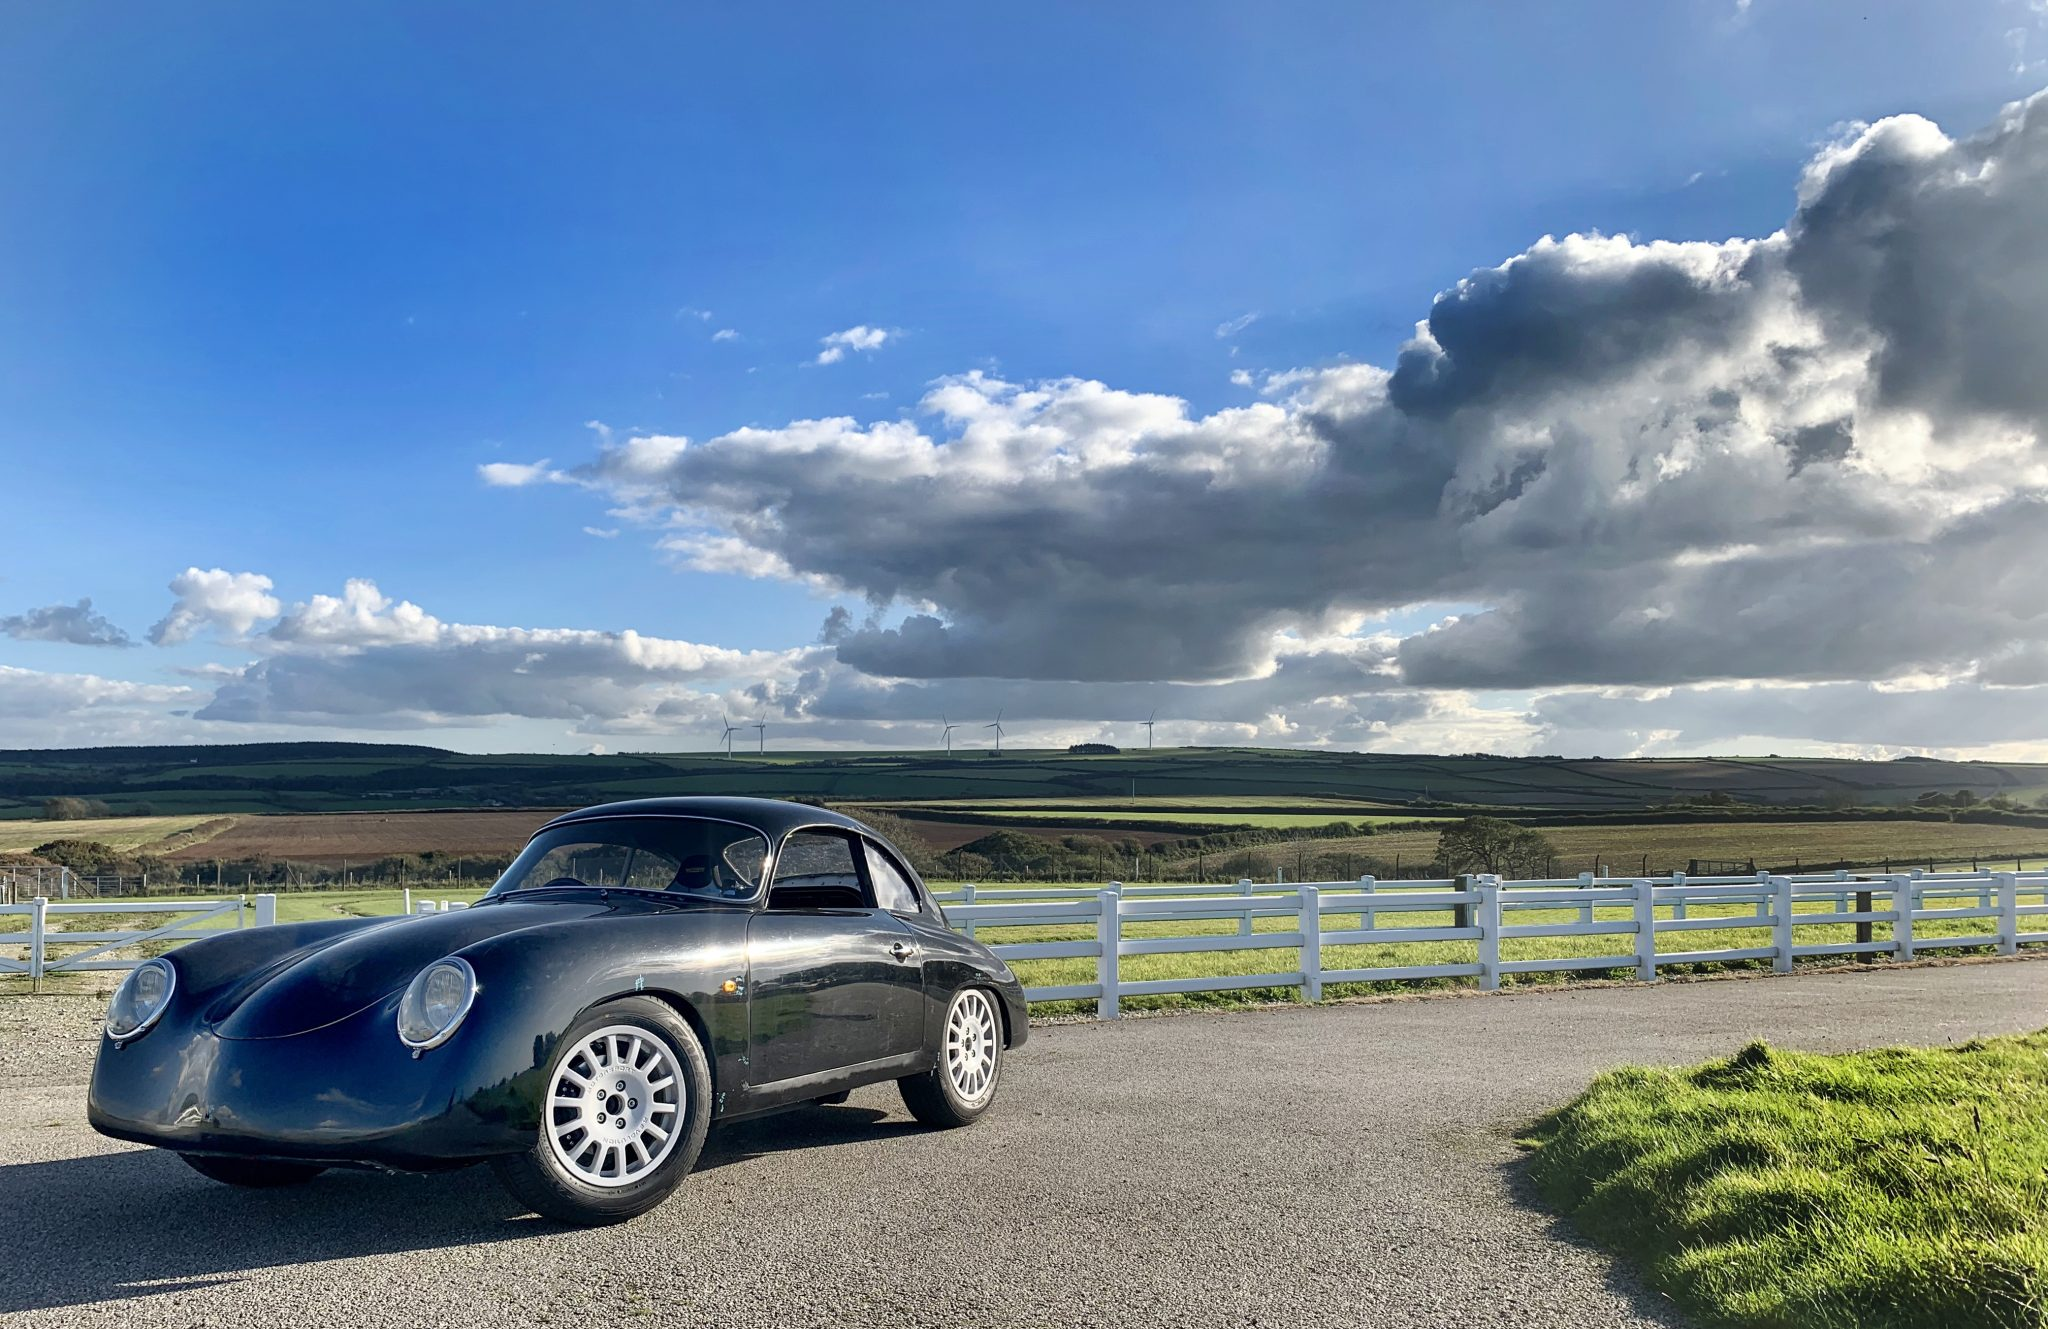 Say Watt? This Porsche 356 lookalike is all electric